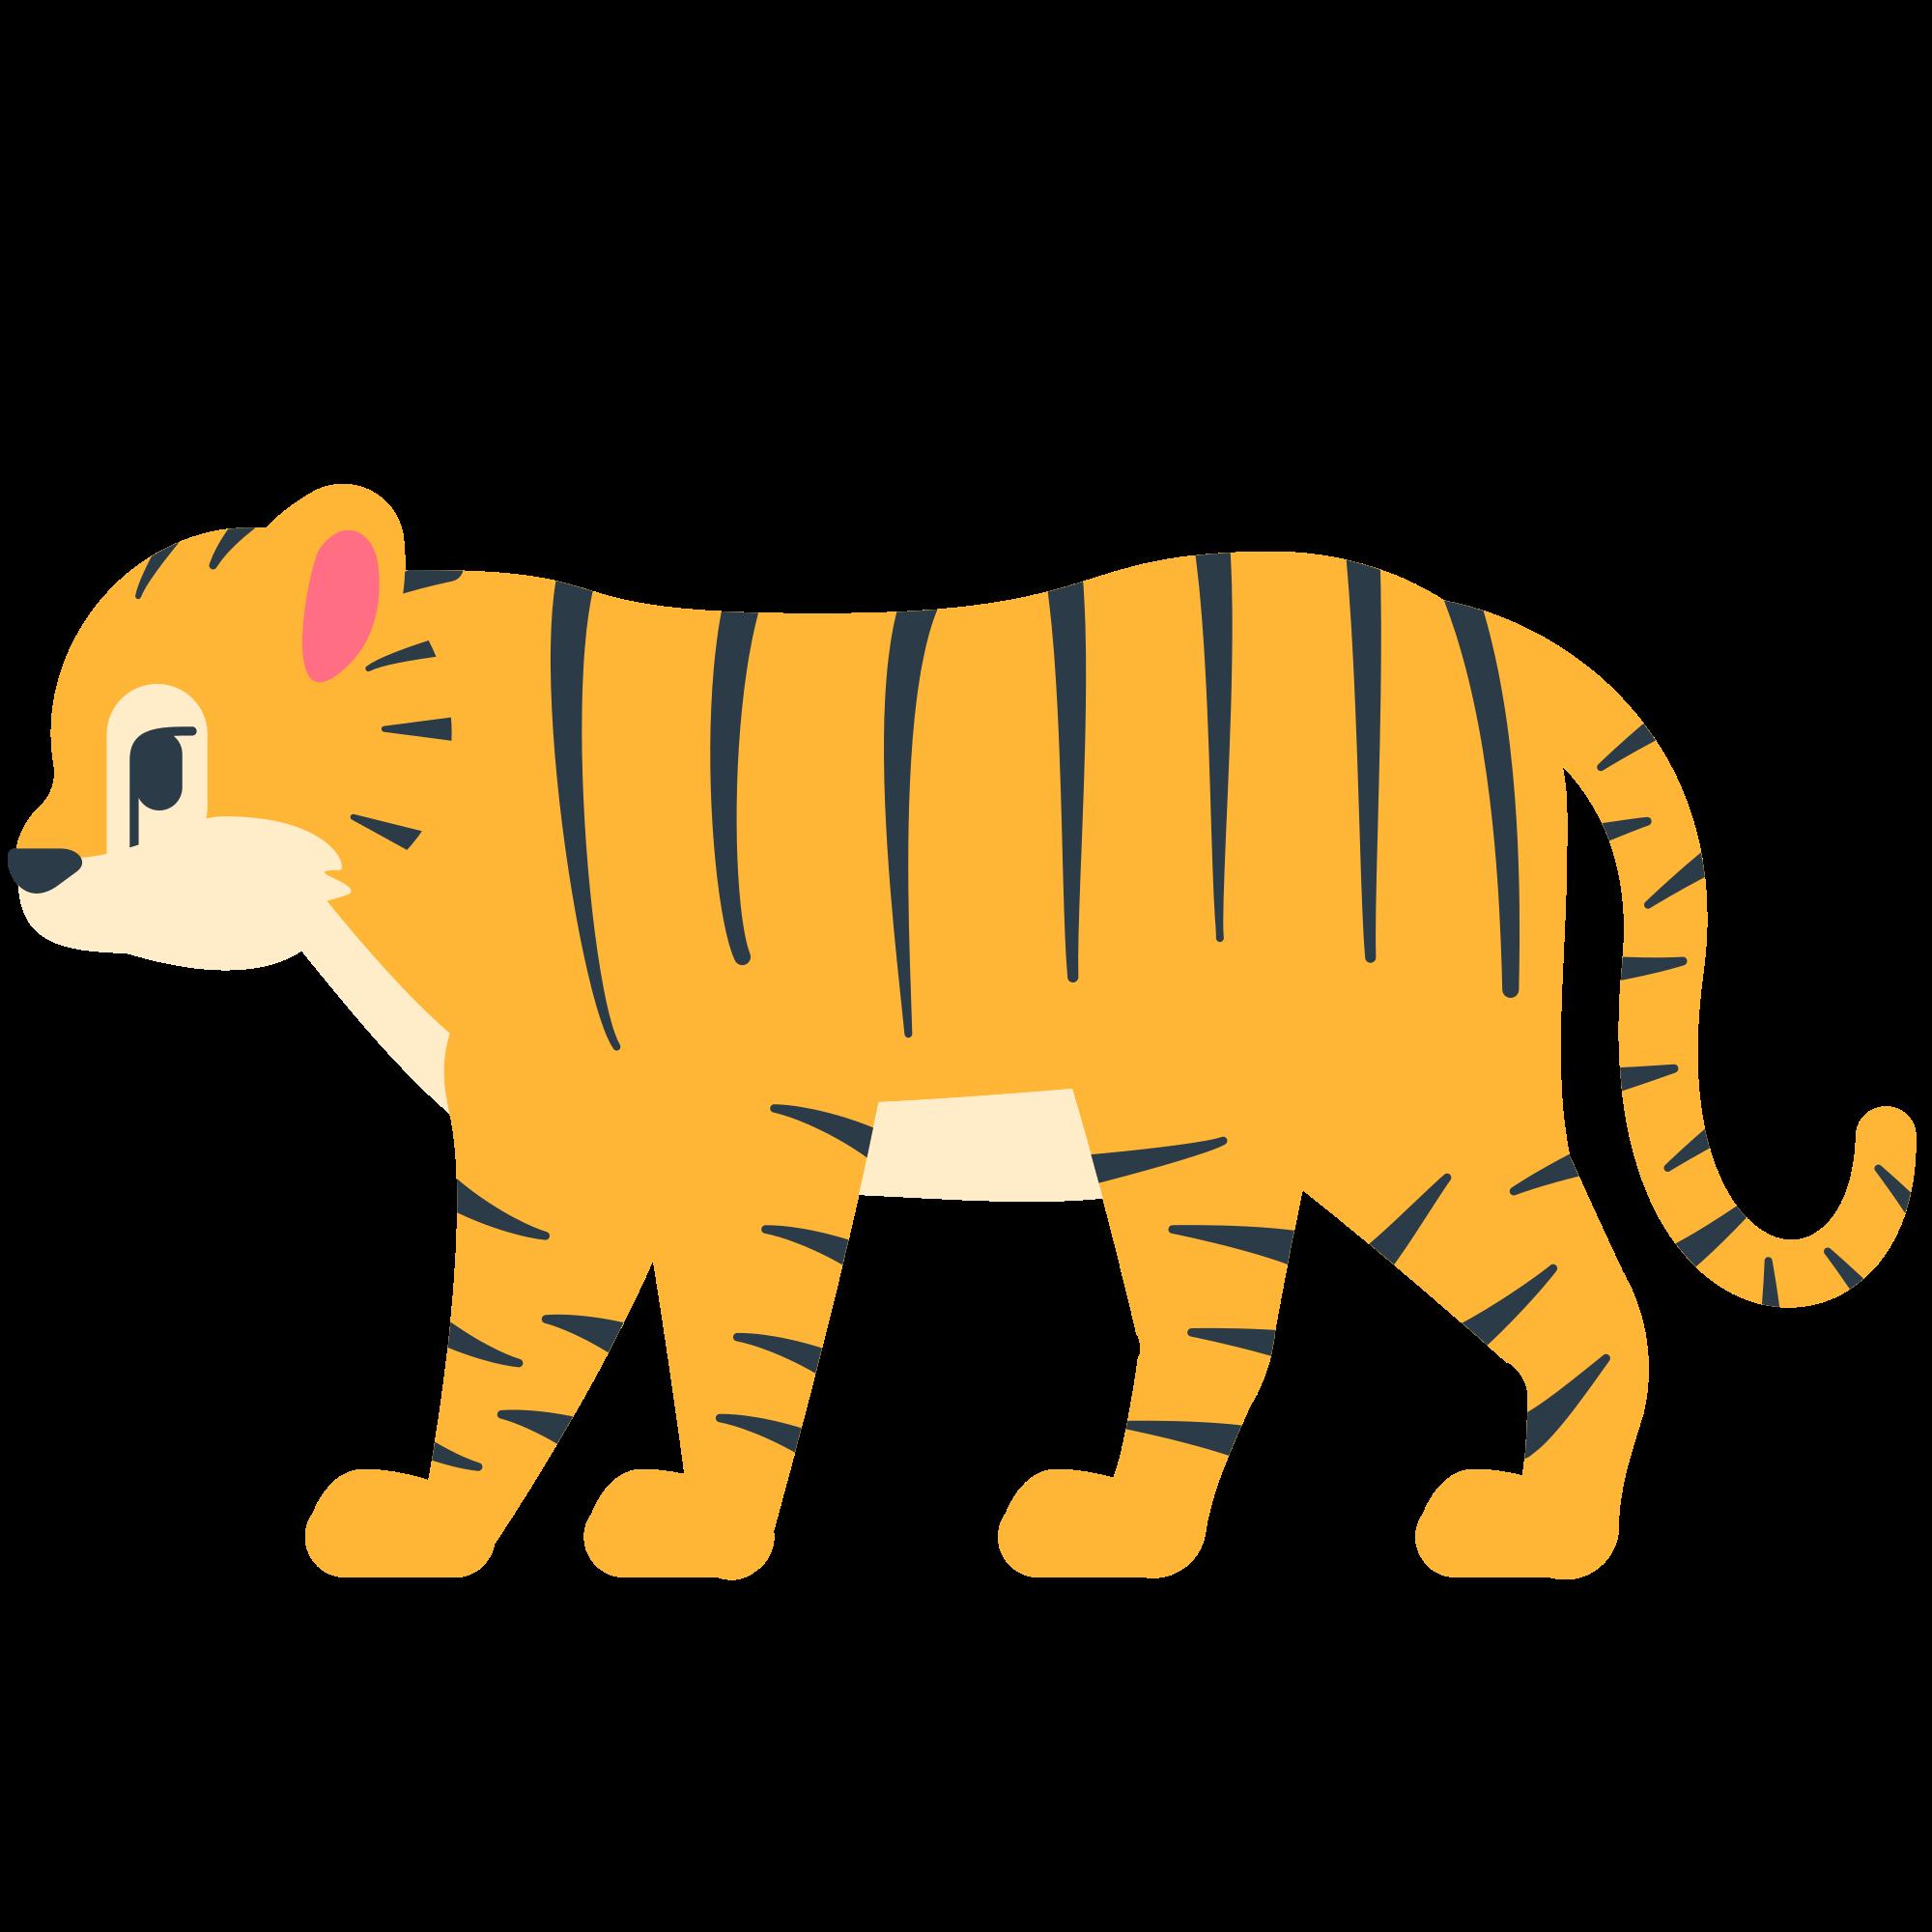 Emoji clipart tiger. File fxemoji u f